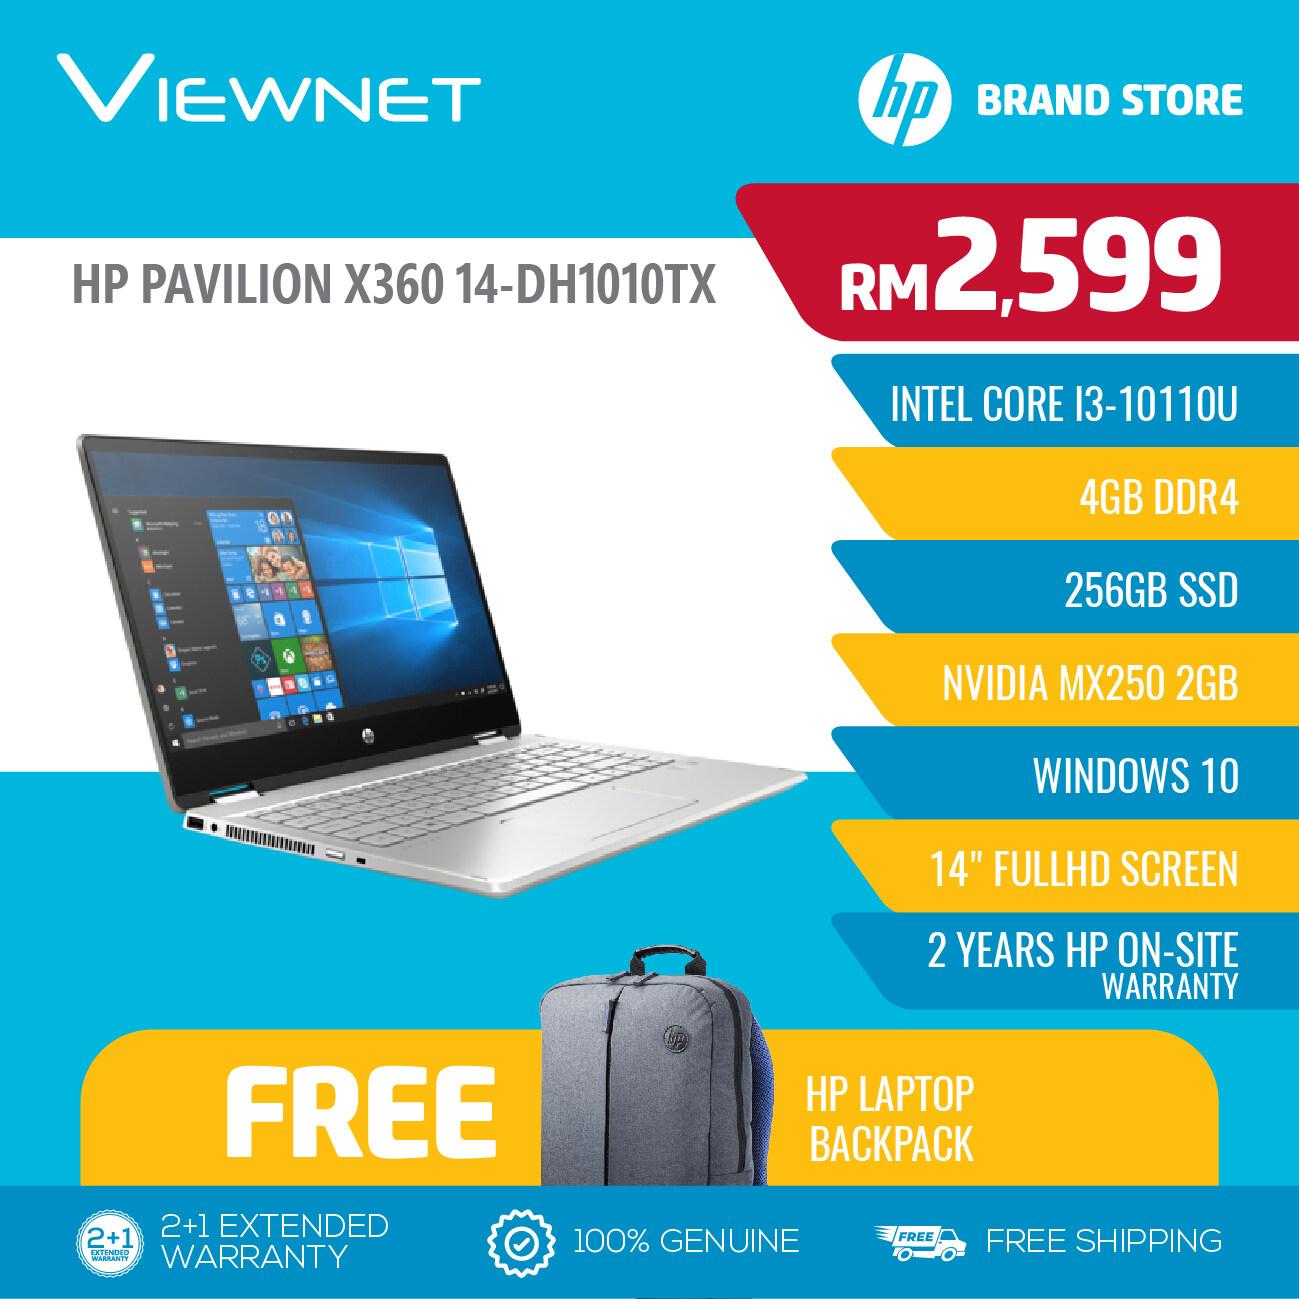 PAVILION X360 14-DH1010TX: INTEL CORE I3-10110U/4GB DDR4/256GB SSD/NV MX250 2GB/W10/14  FHD (8LW60PA) #2YEARS ON-SITE Malaysia